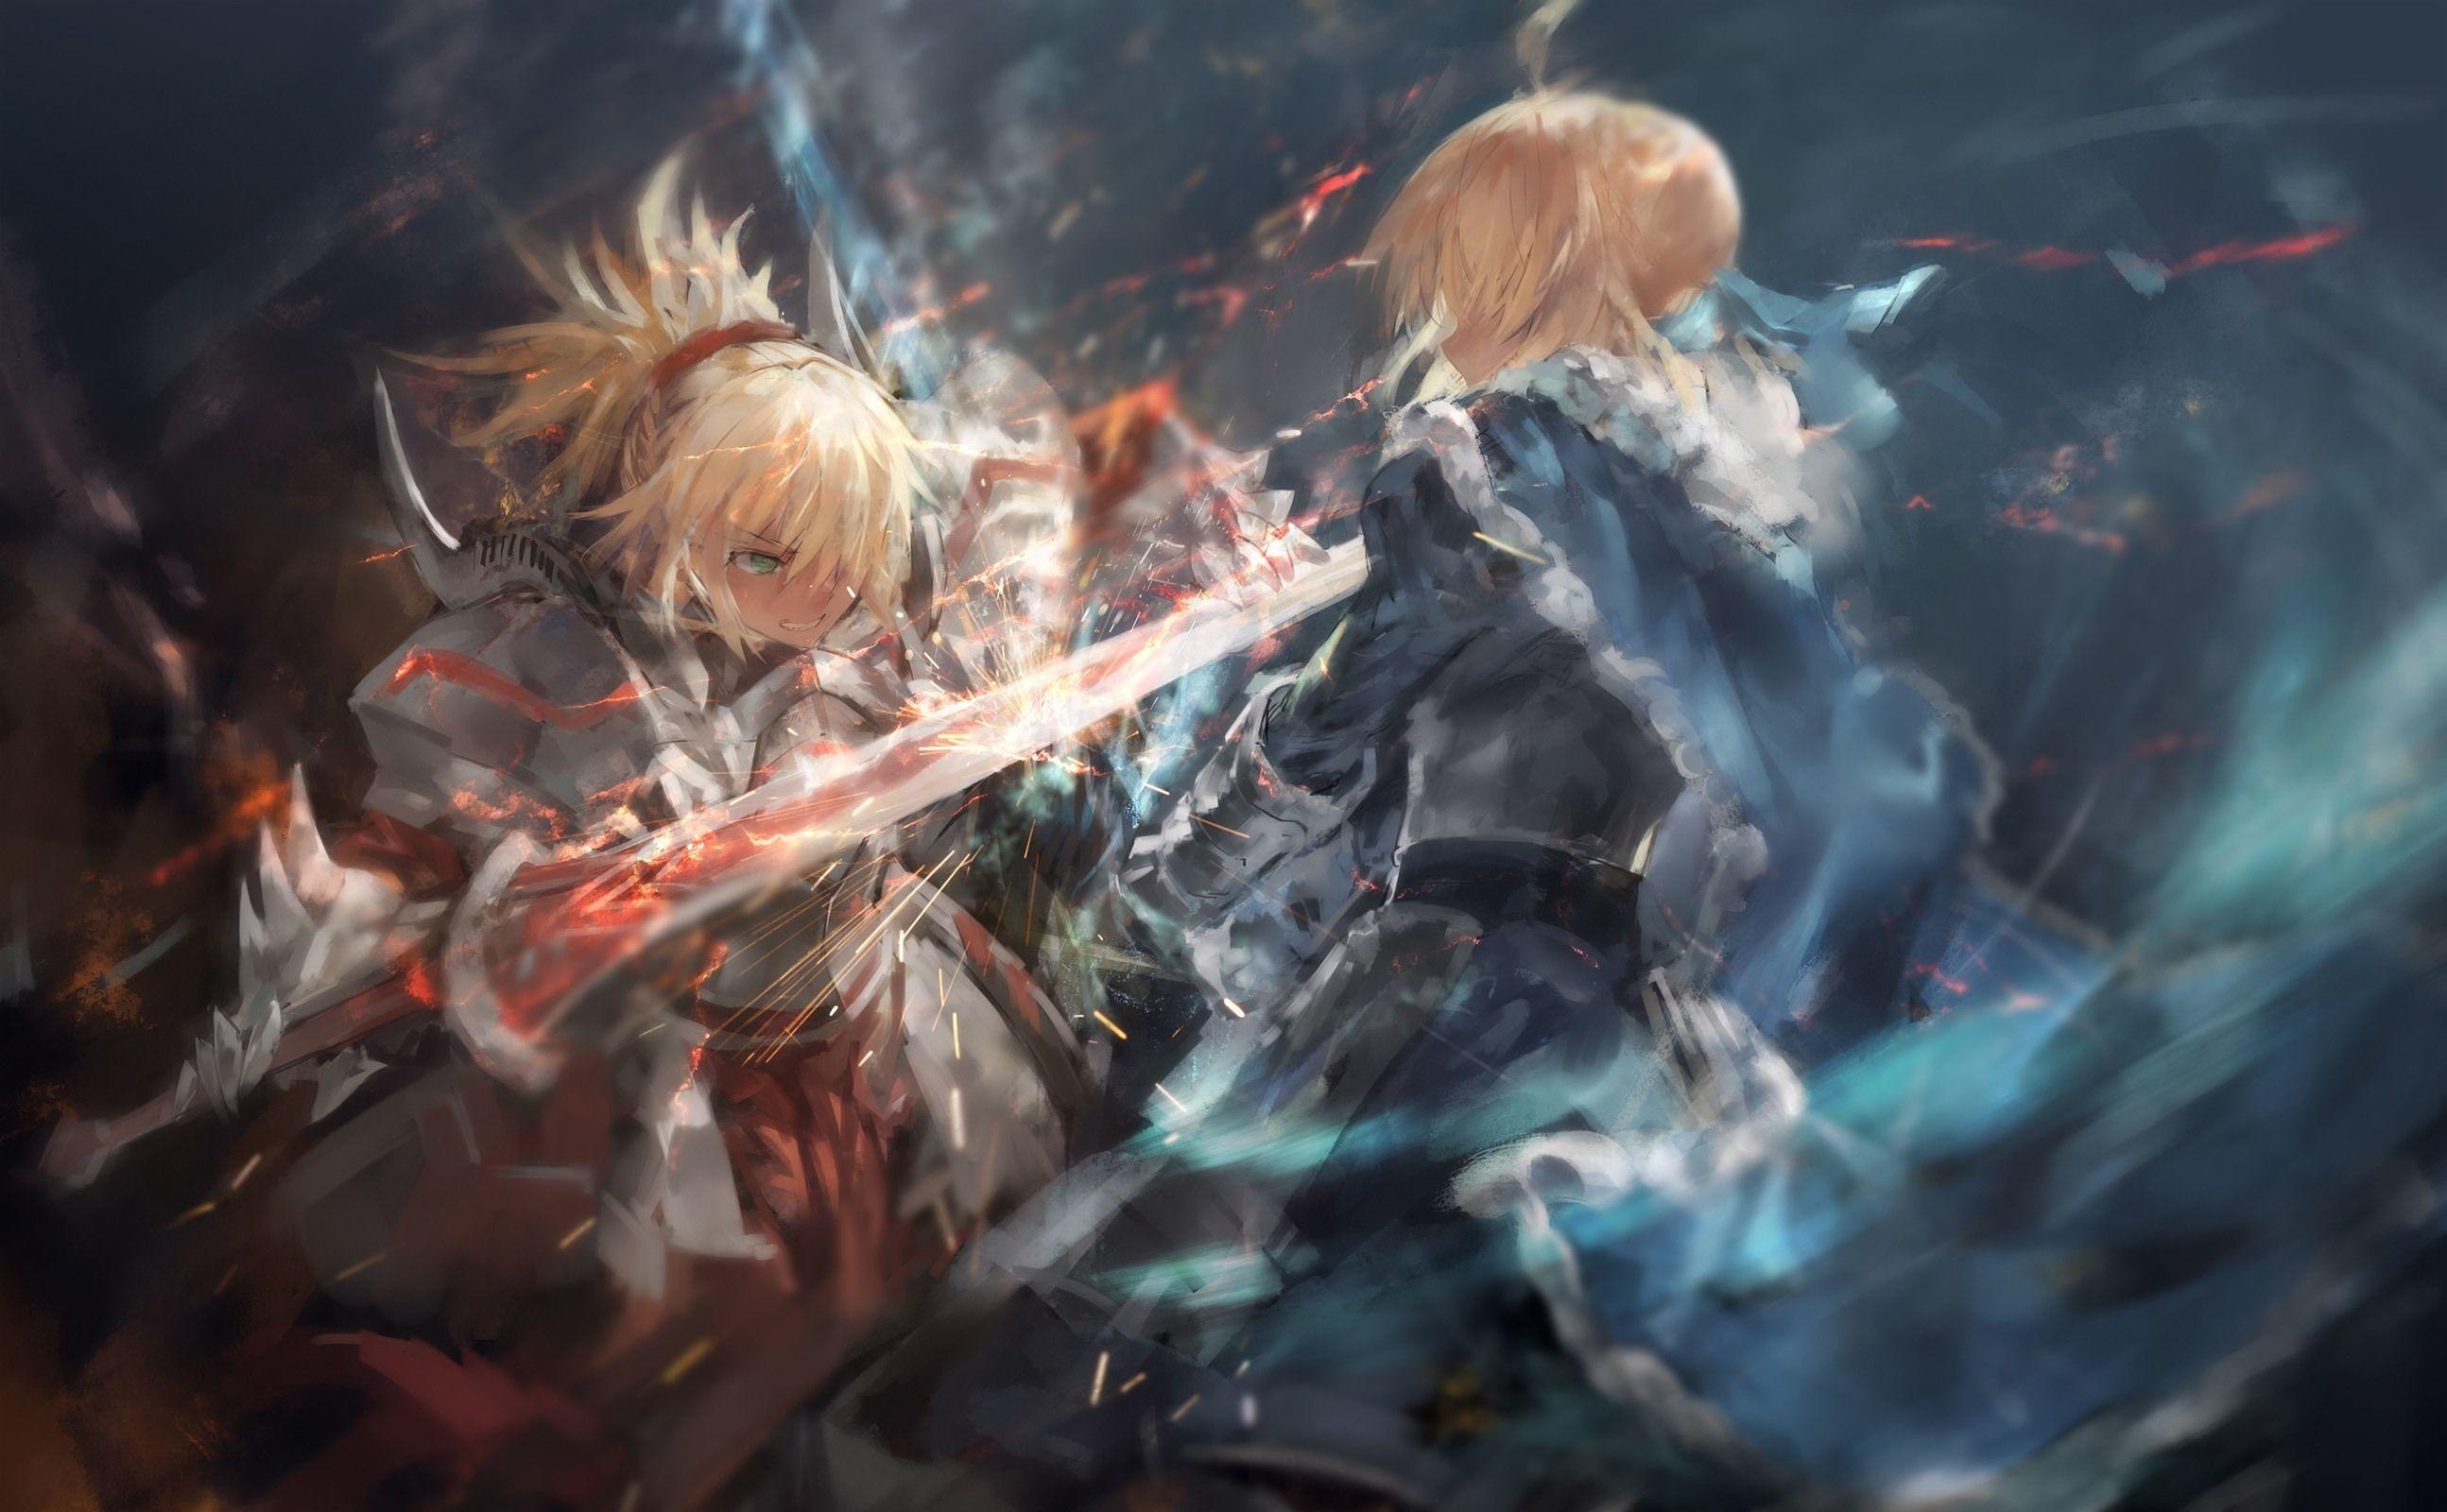 My Anime PIN image by Yuki Lim Fate apocrypha mordred